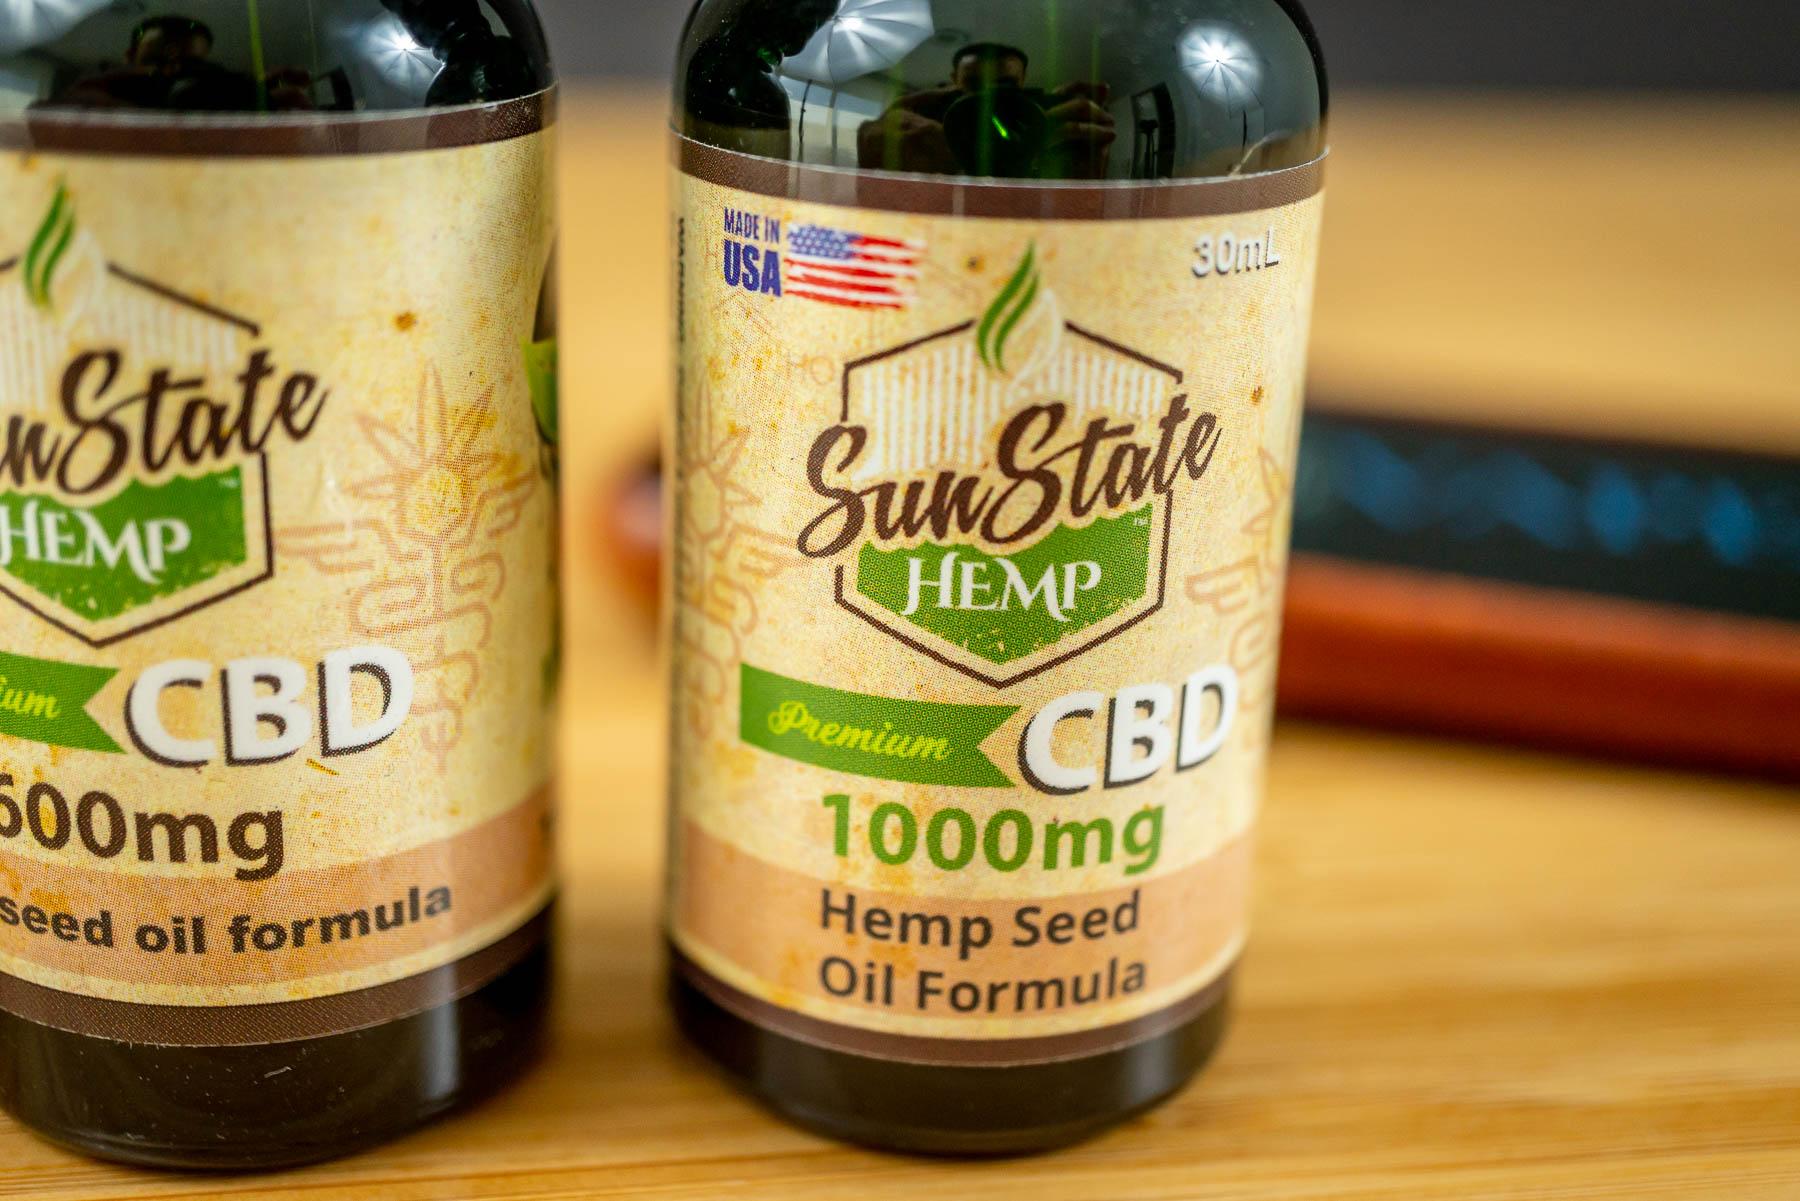 Sun State CBD Oil 1000 mg Hempseed Oil